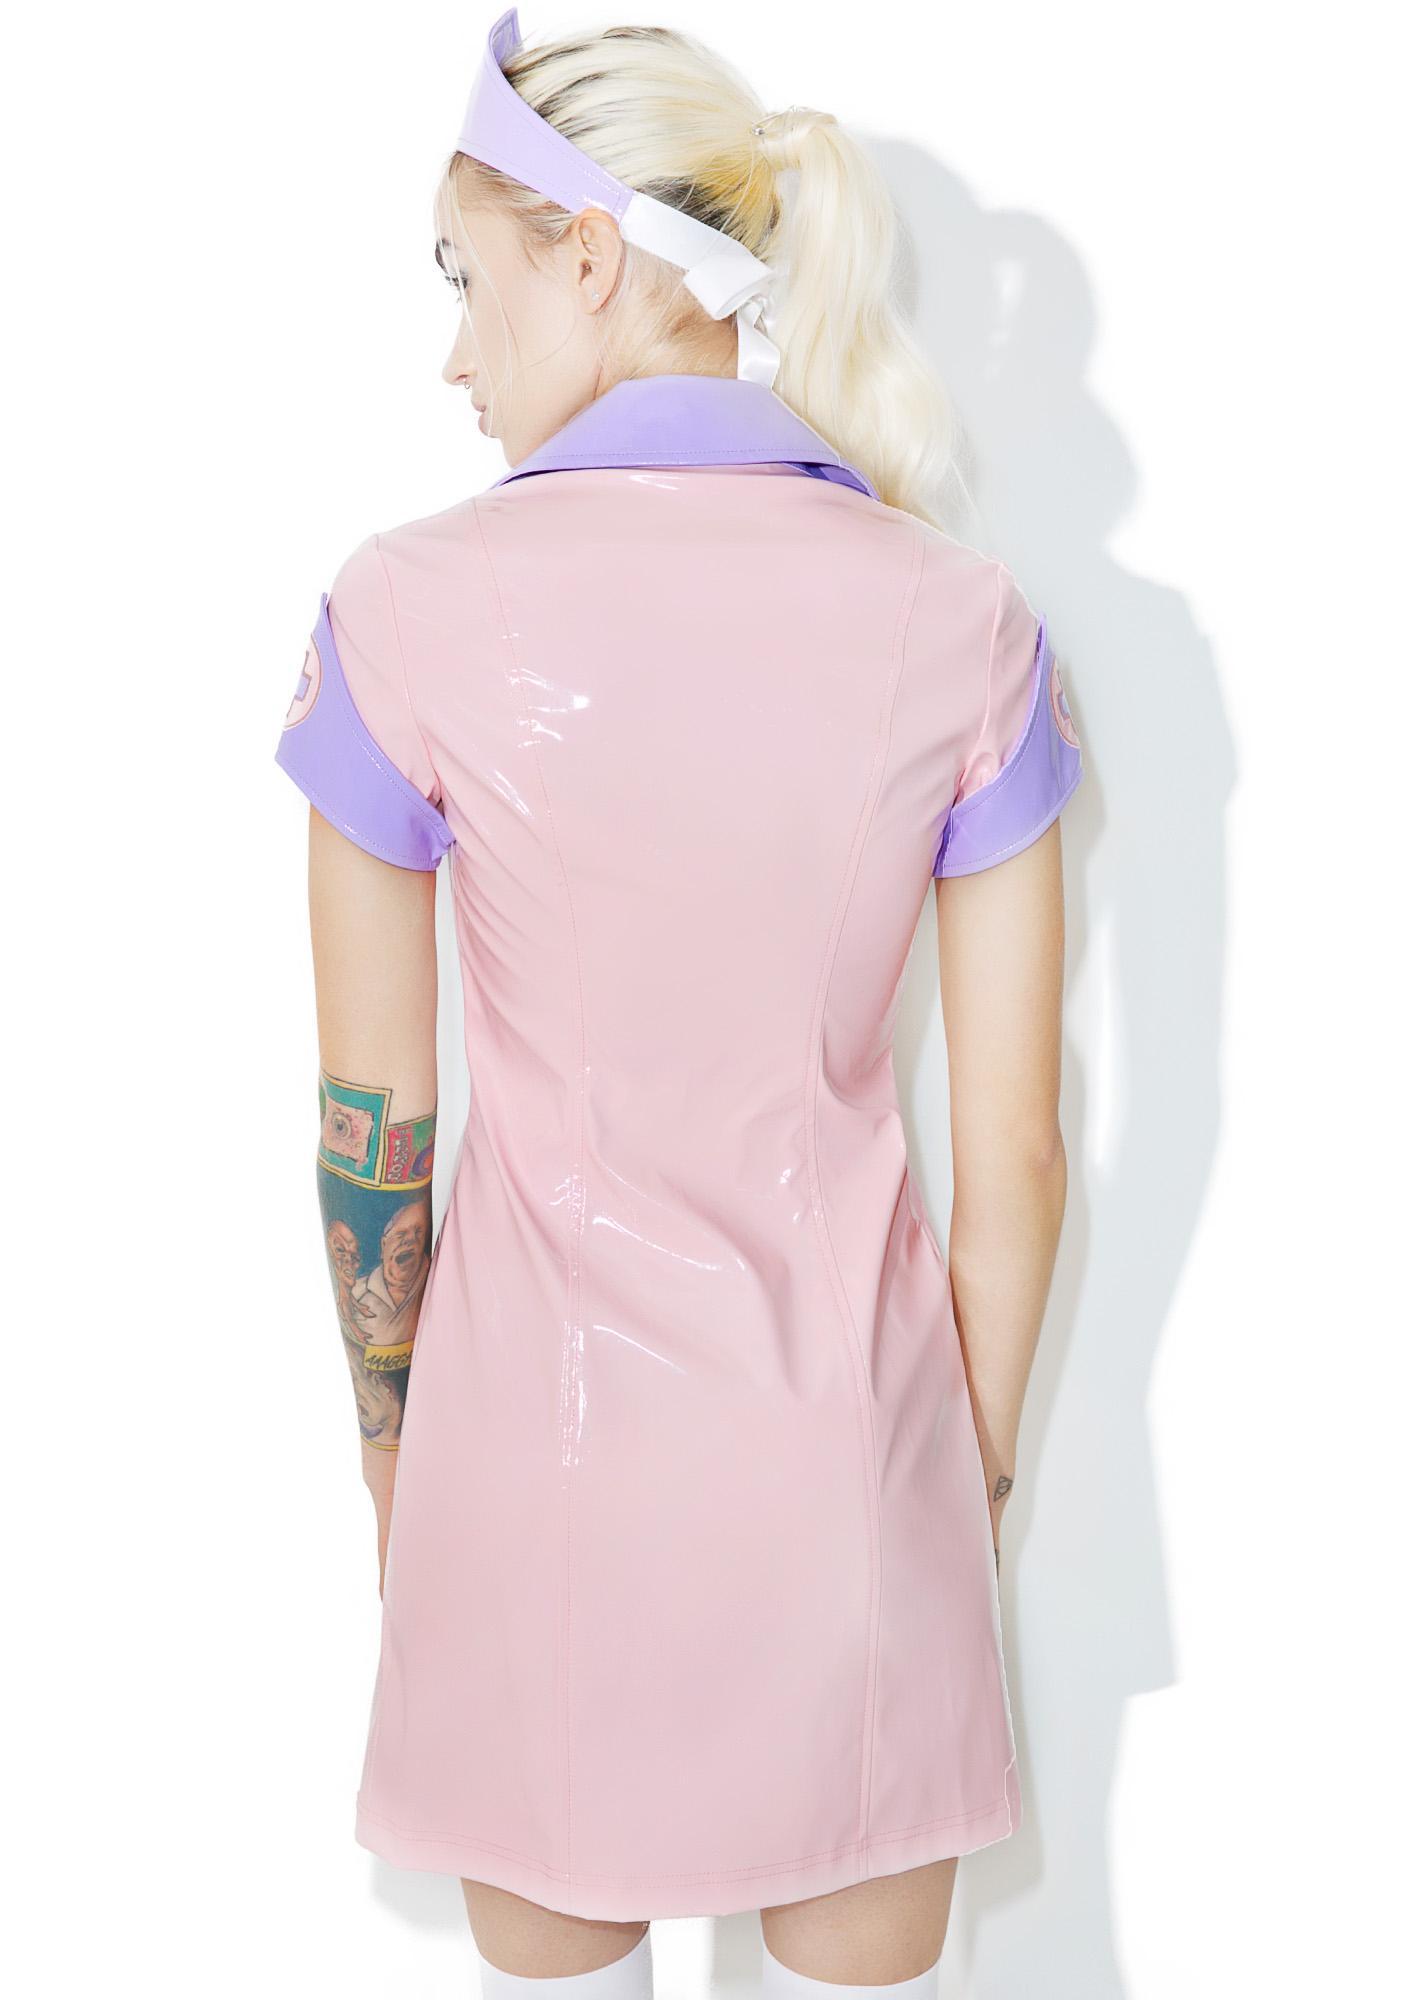 Y.R.U. Intensive Care Costume Set